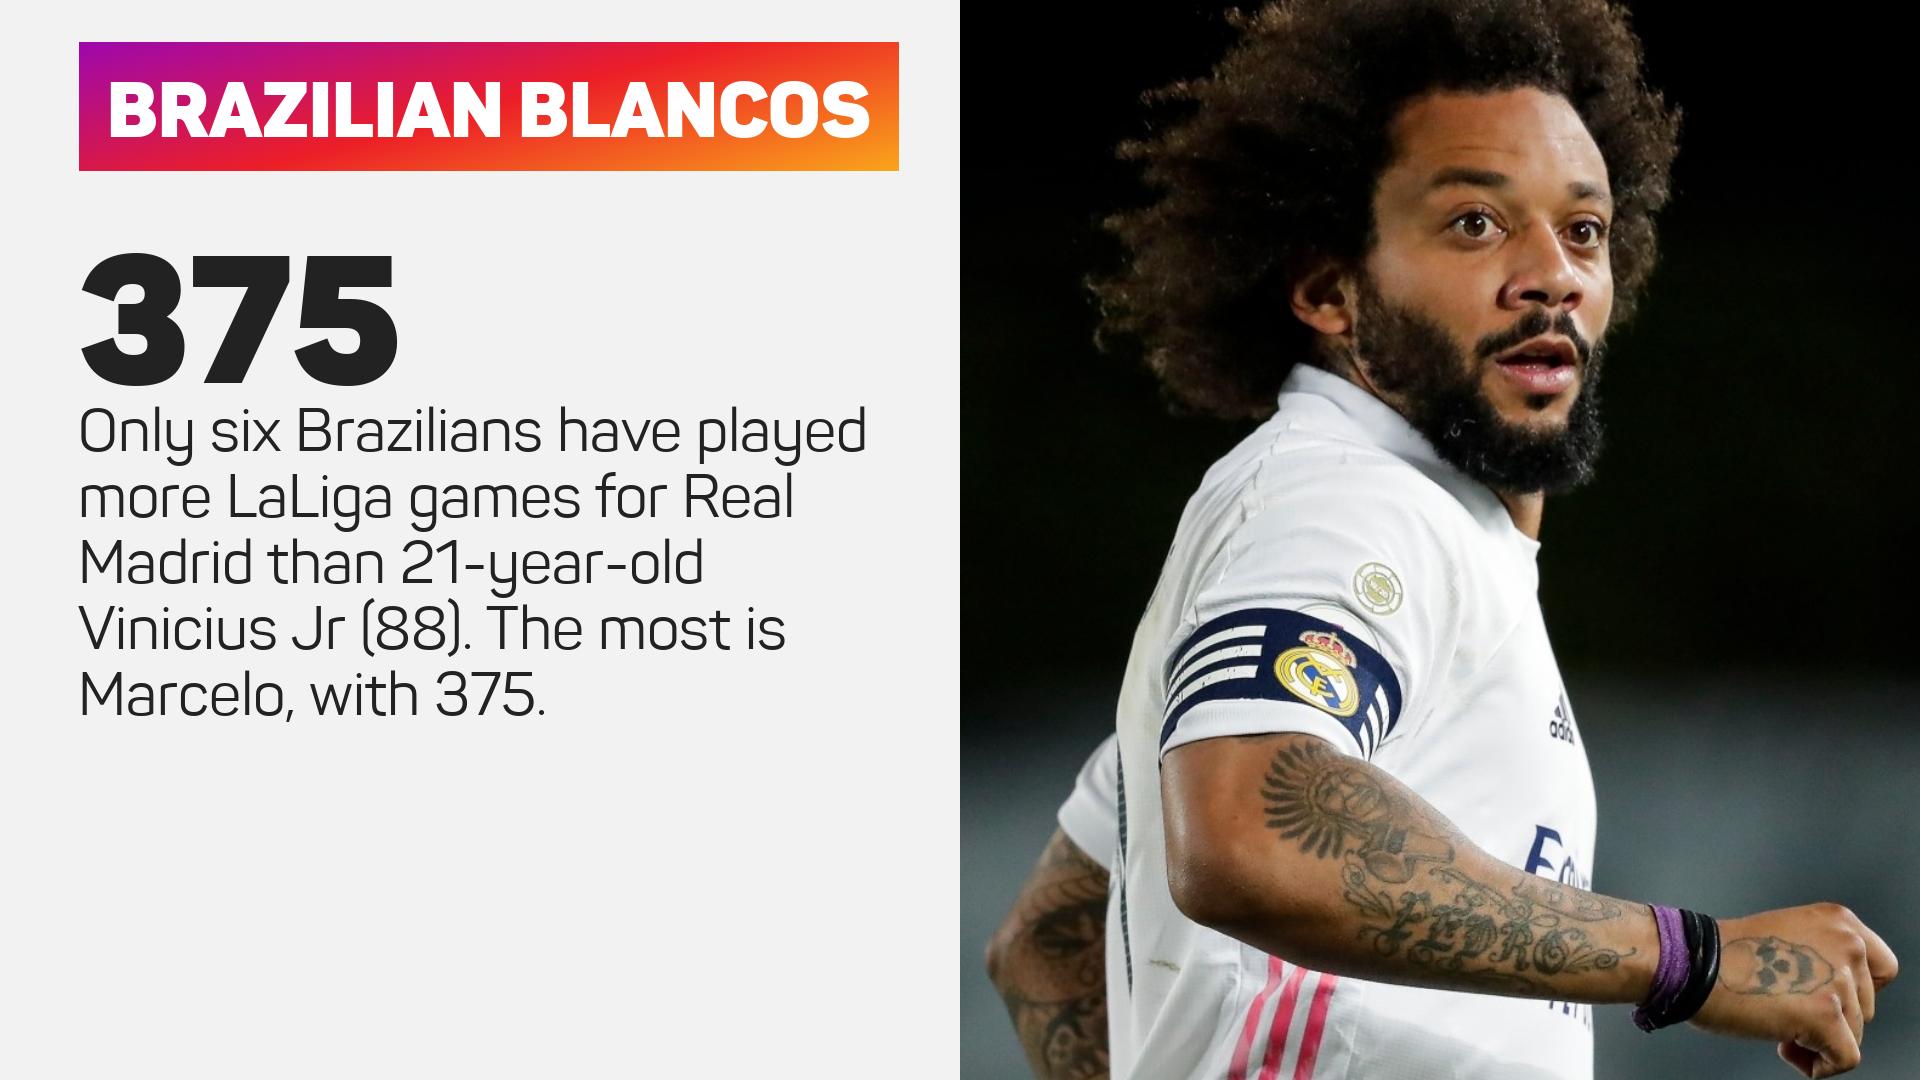 Marcelo for Real Madrid